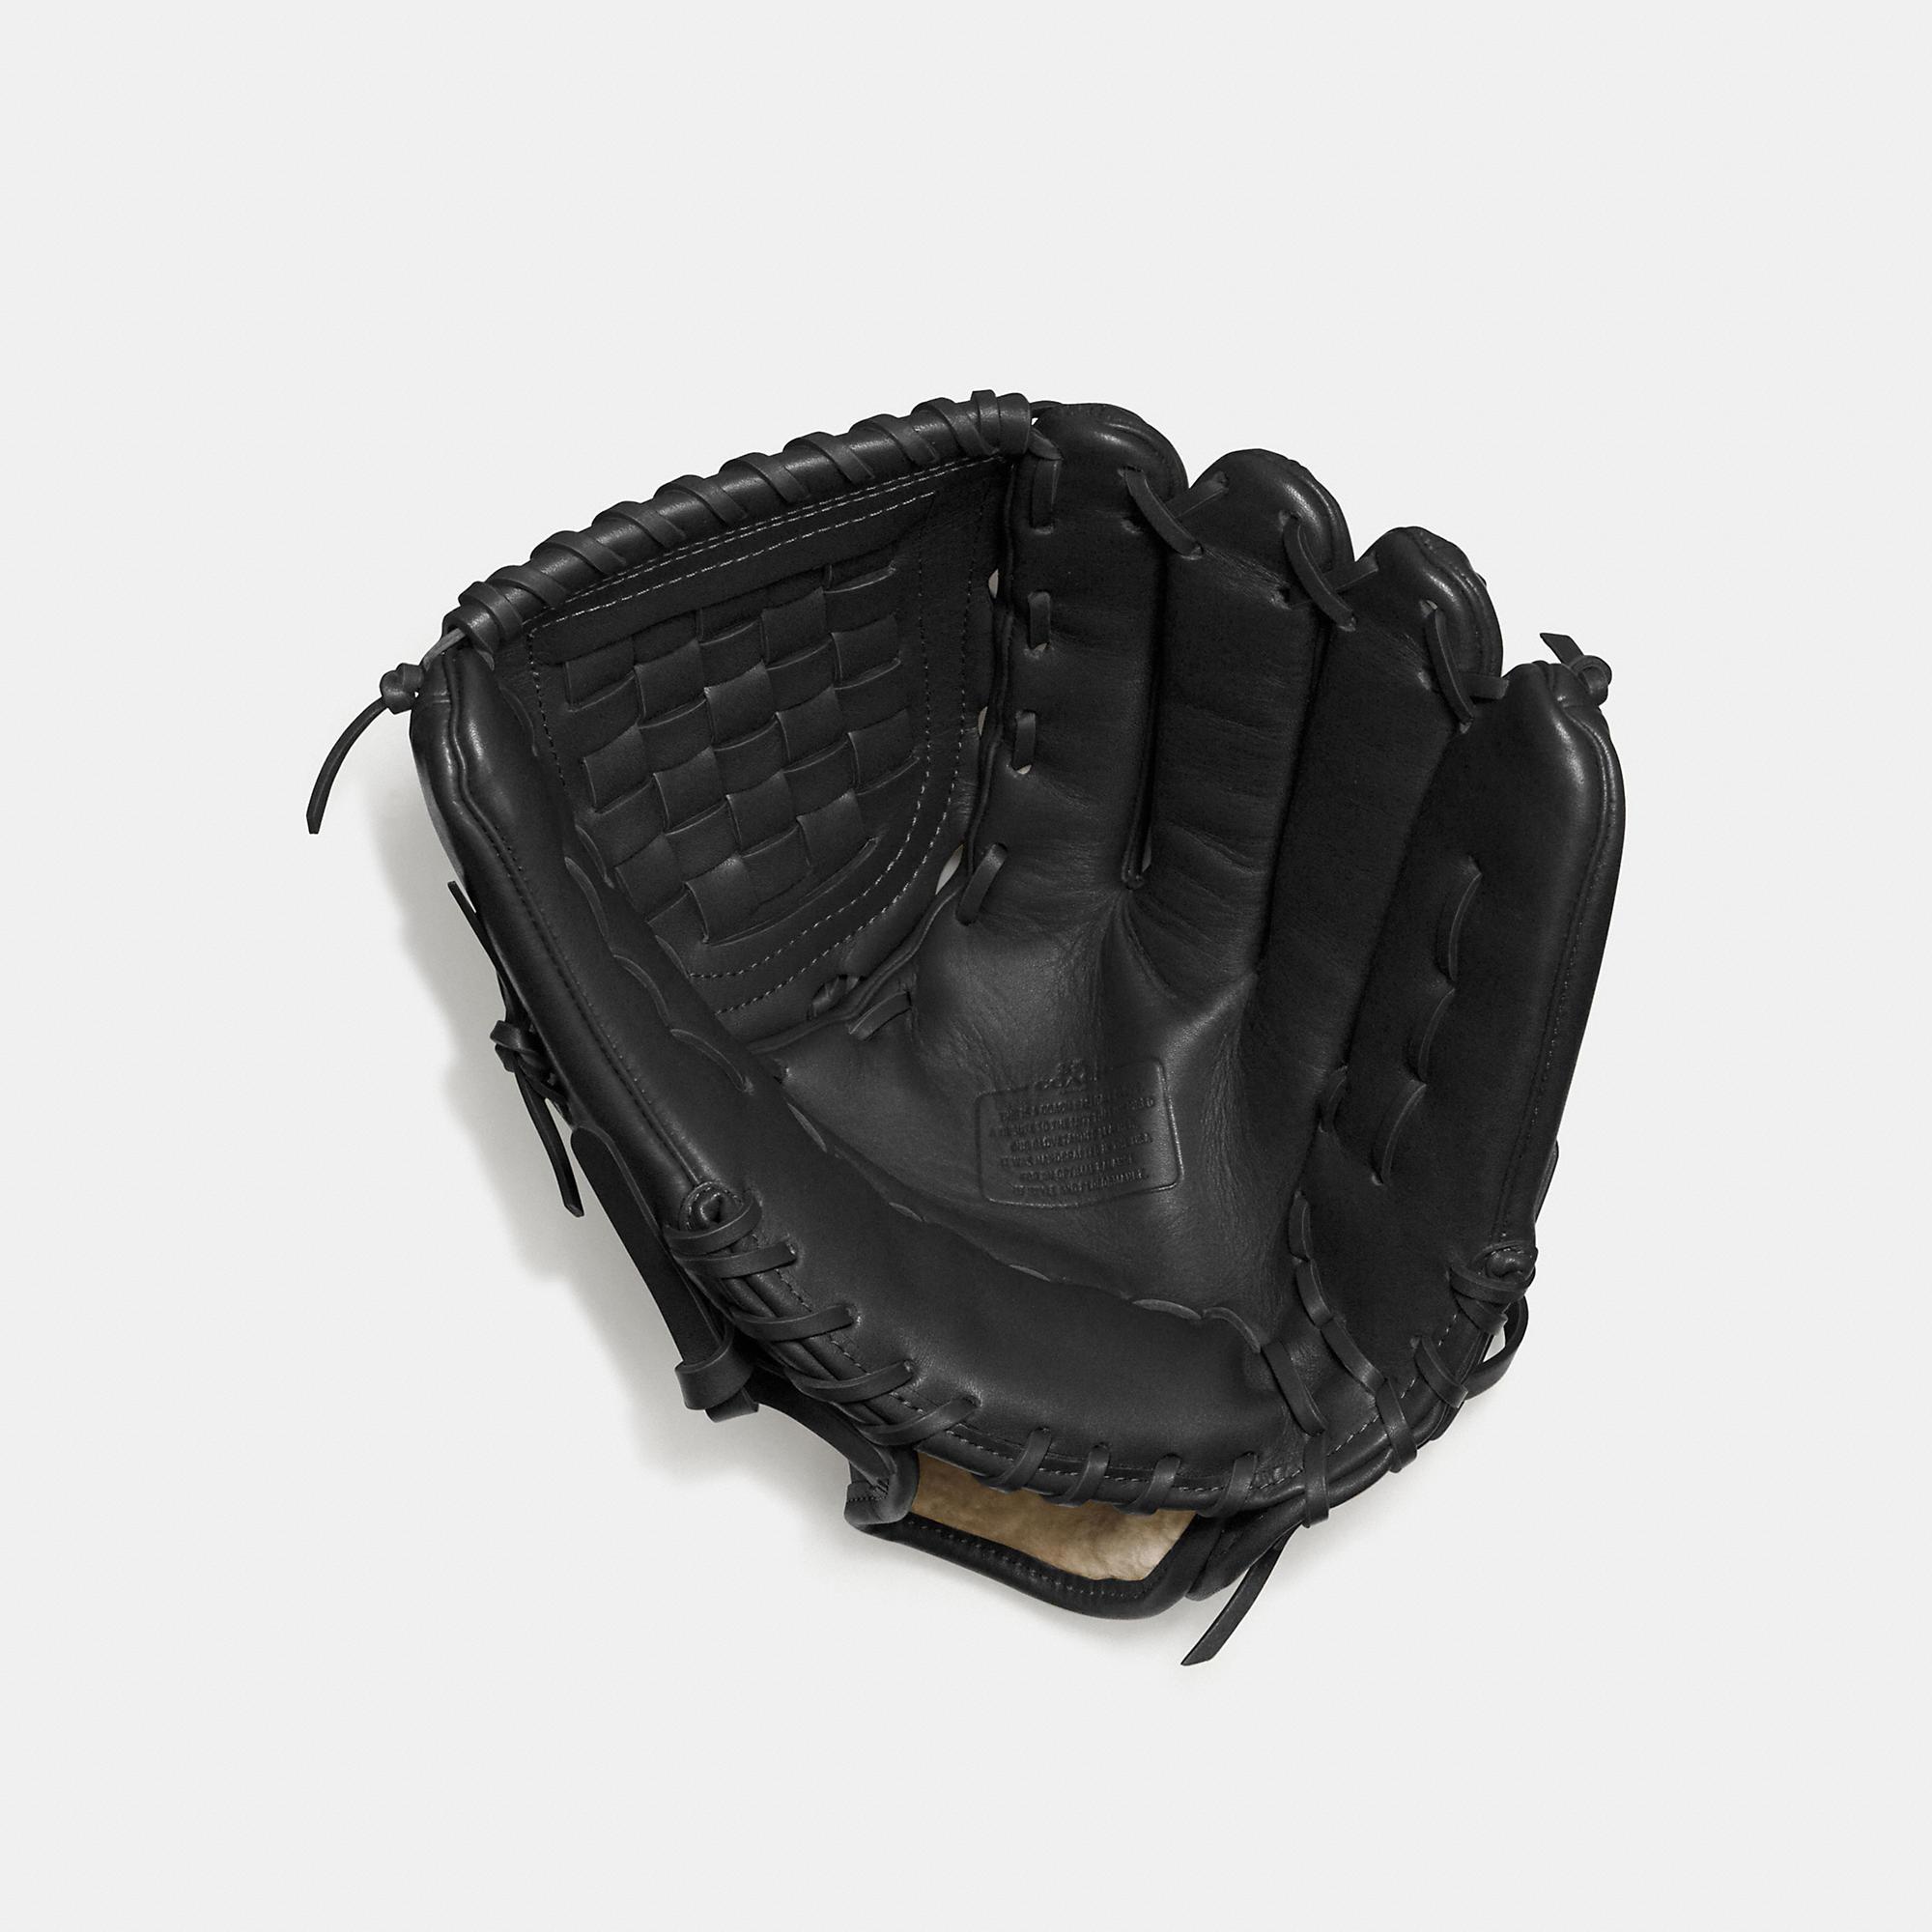 Coach Baseball Glove In Glovetanned Leather